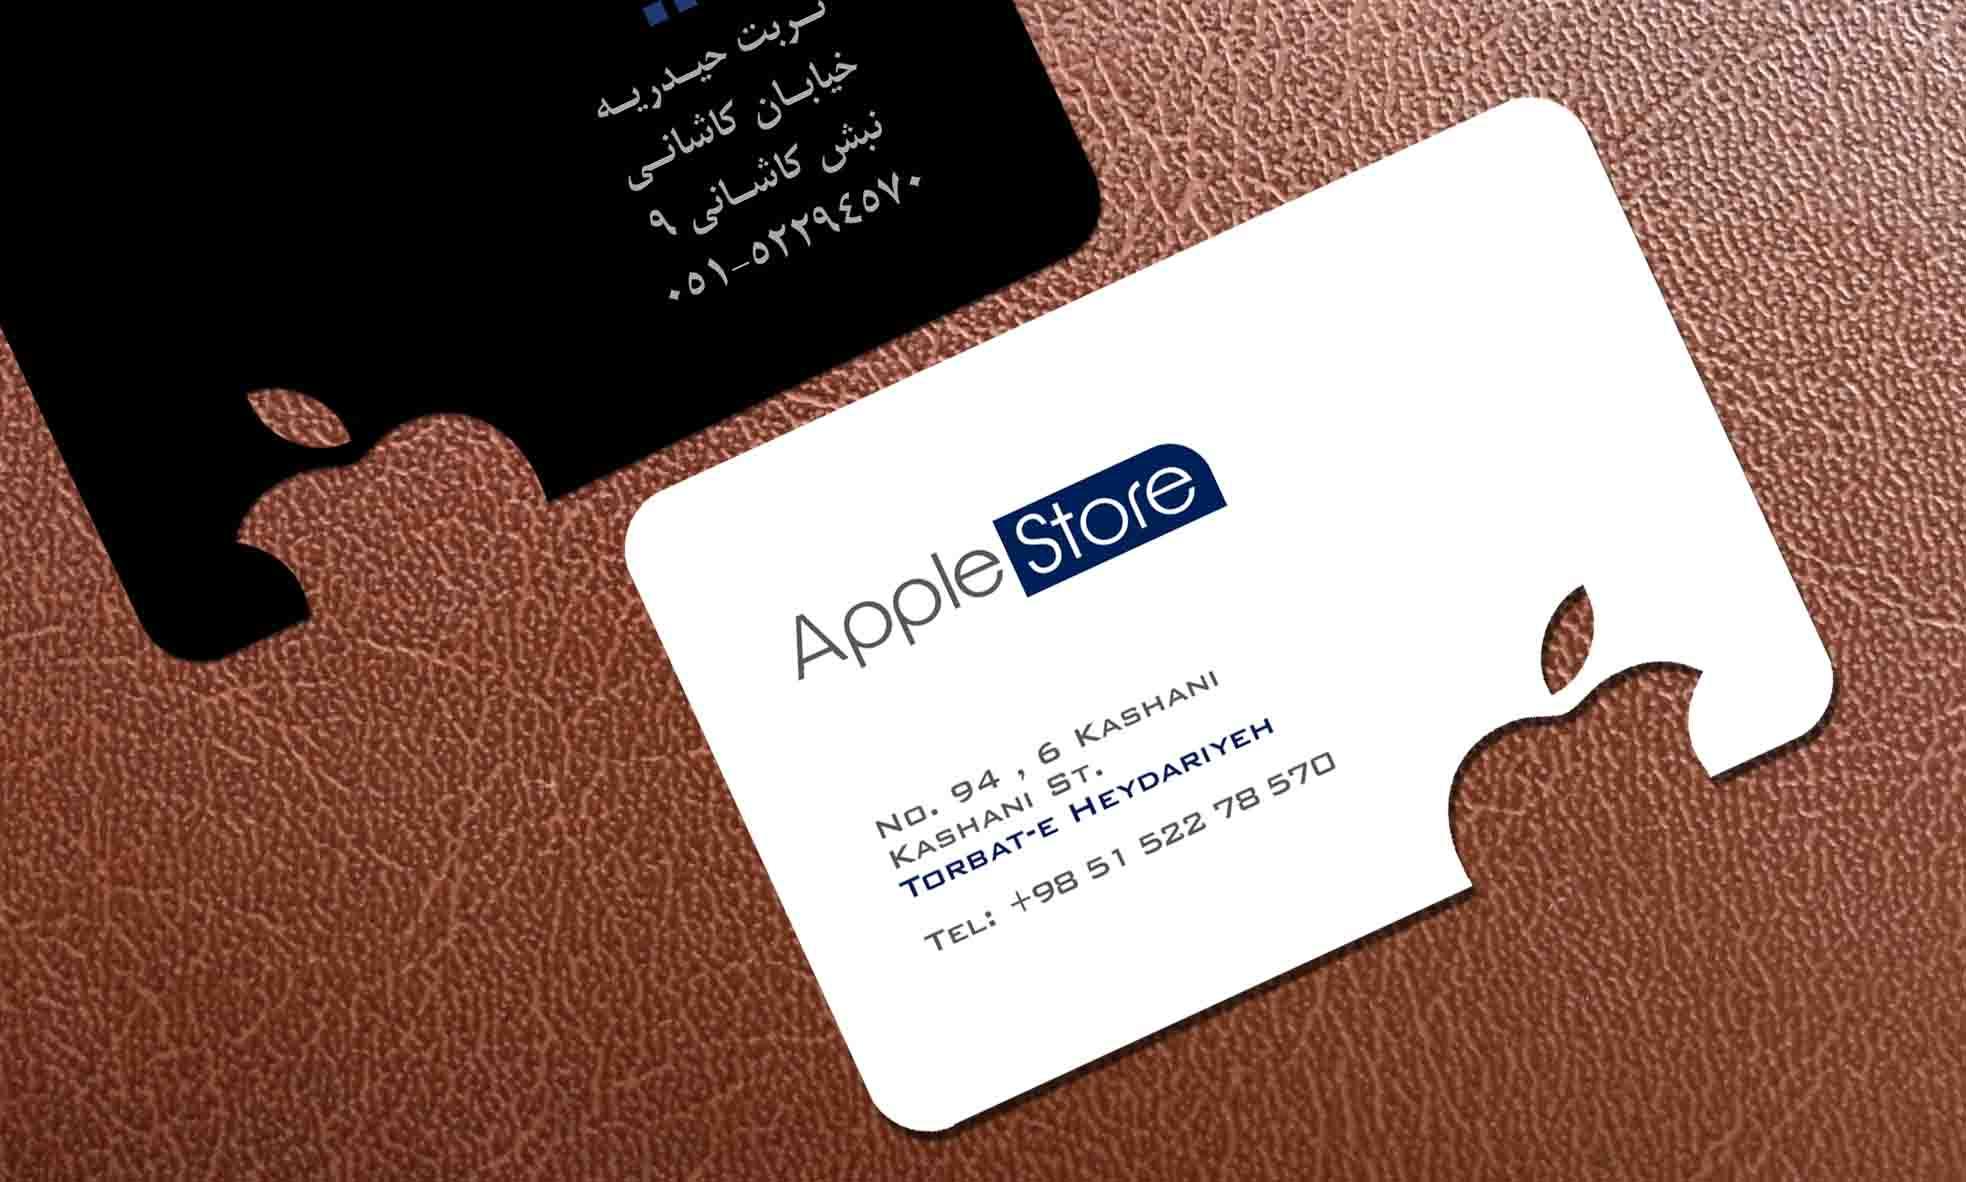 کارت ویزیت  موبایل فروشی قالب اختصاصی